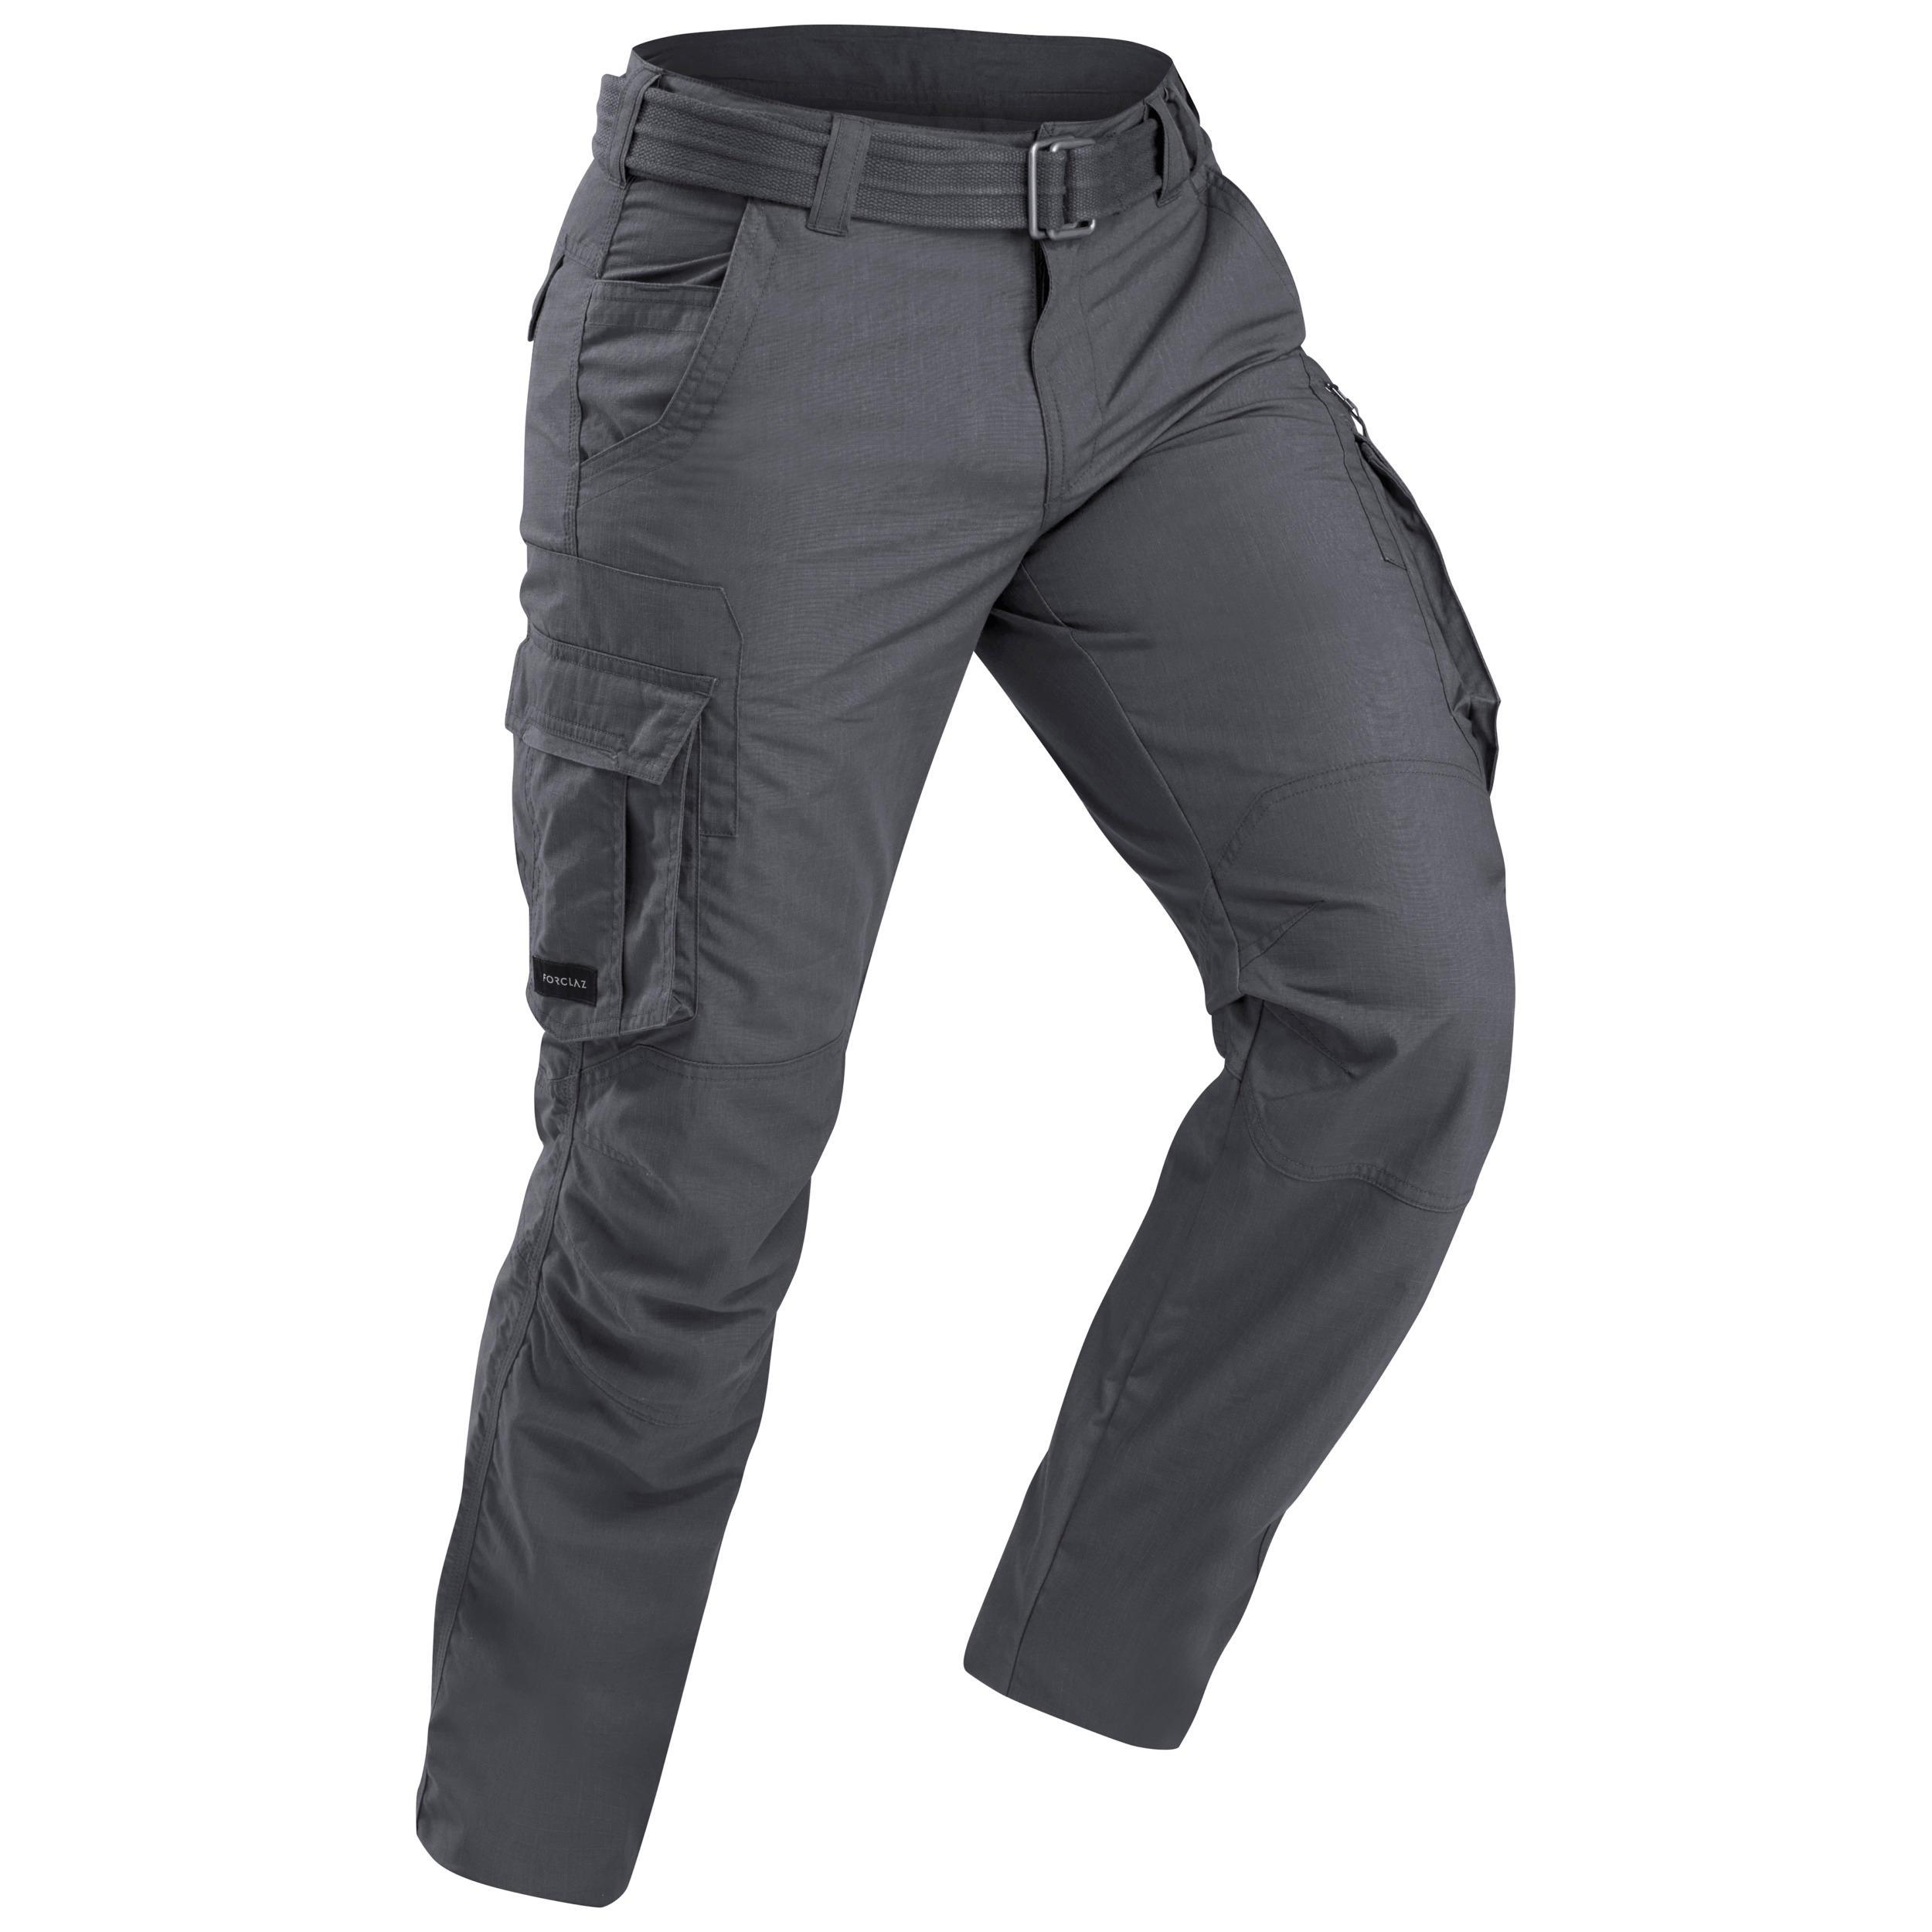 Pantalon TRAVEL 100 Bărbați imagine